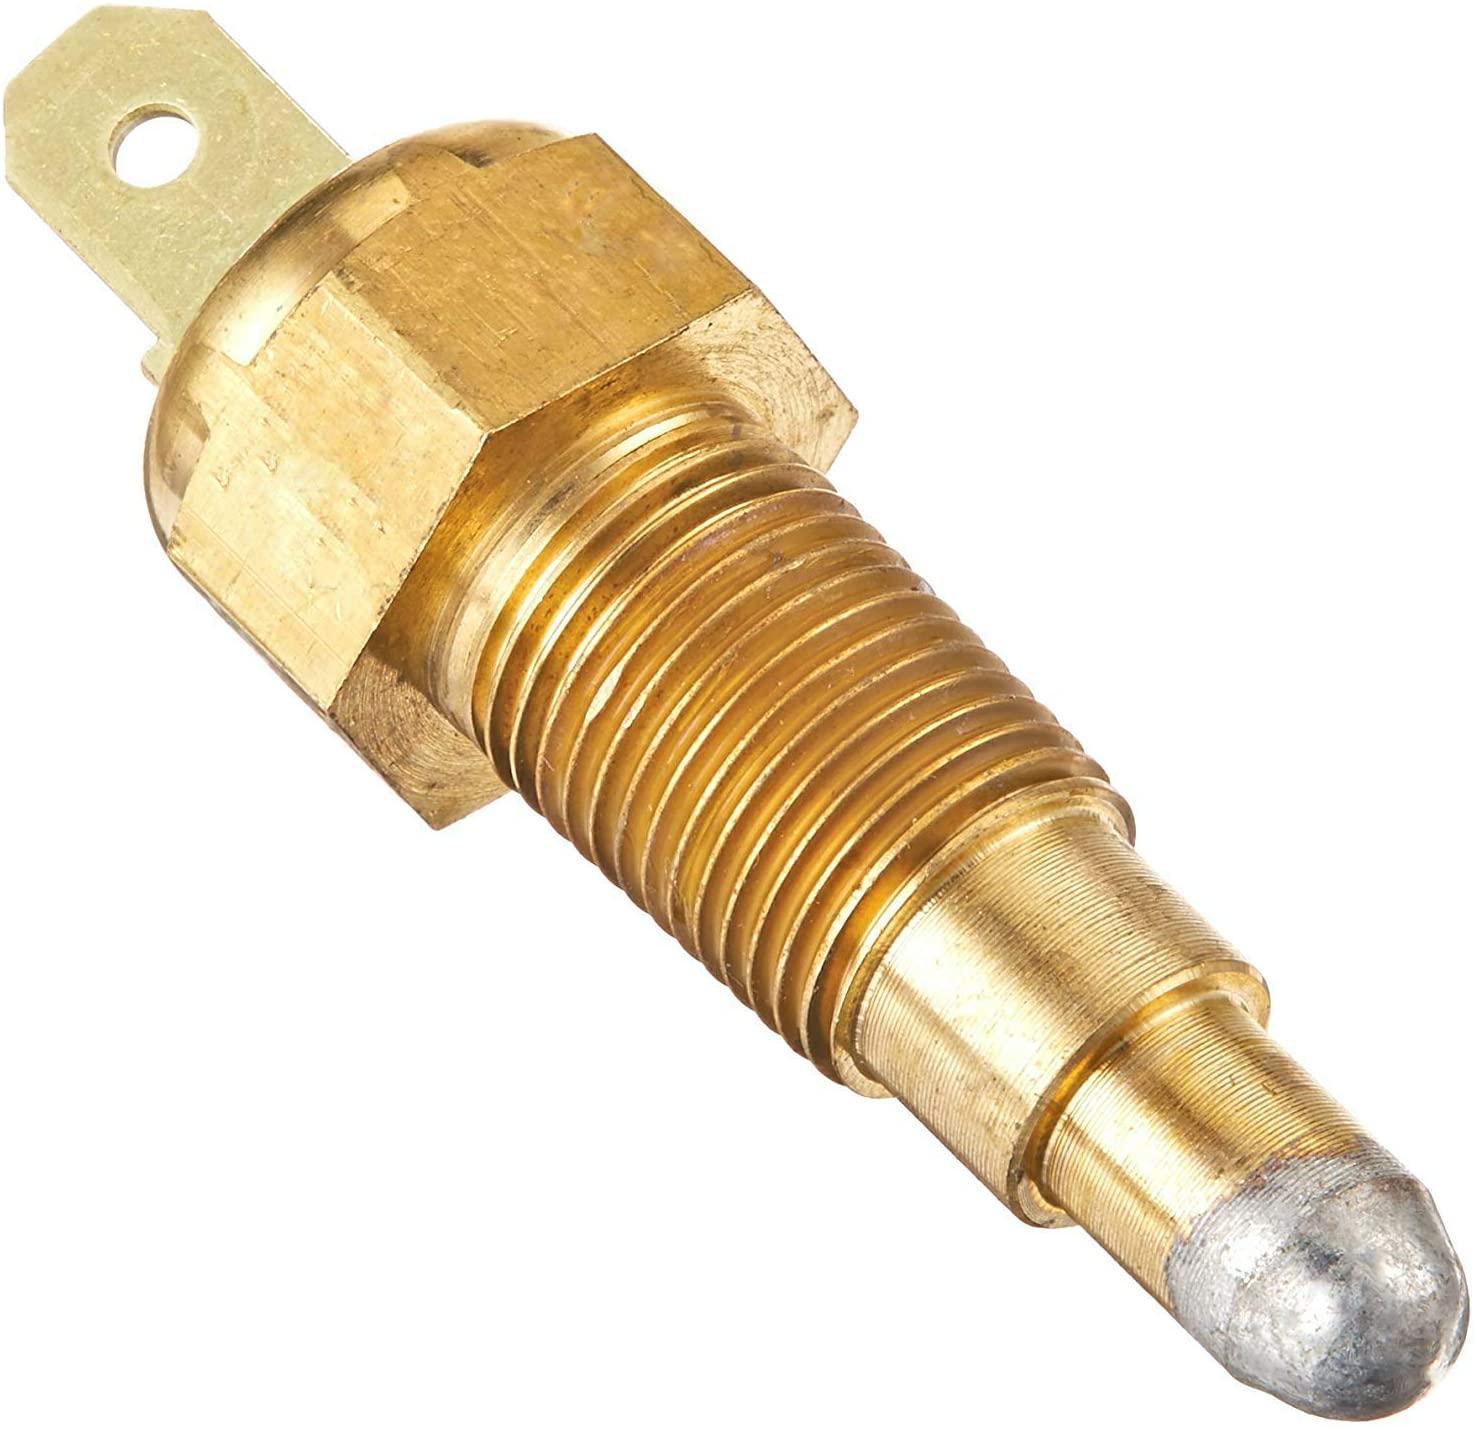 American Volt Ground Thermostat Switch Electric Radiator Fan Temperature Sensor Thread-in Engine Probe Kit (1/8